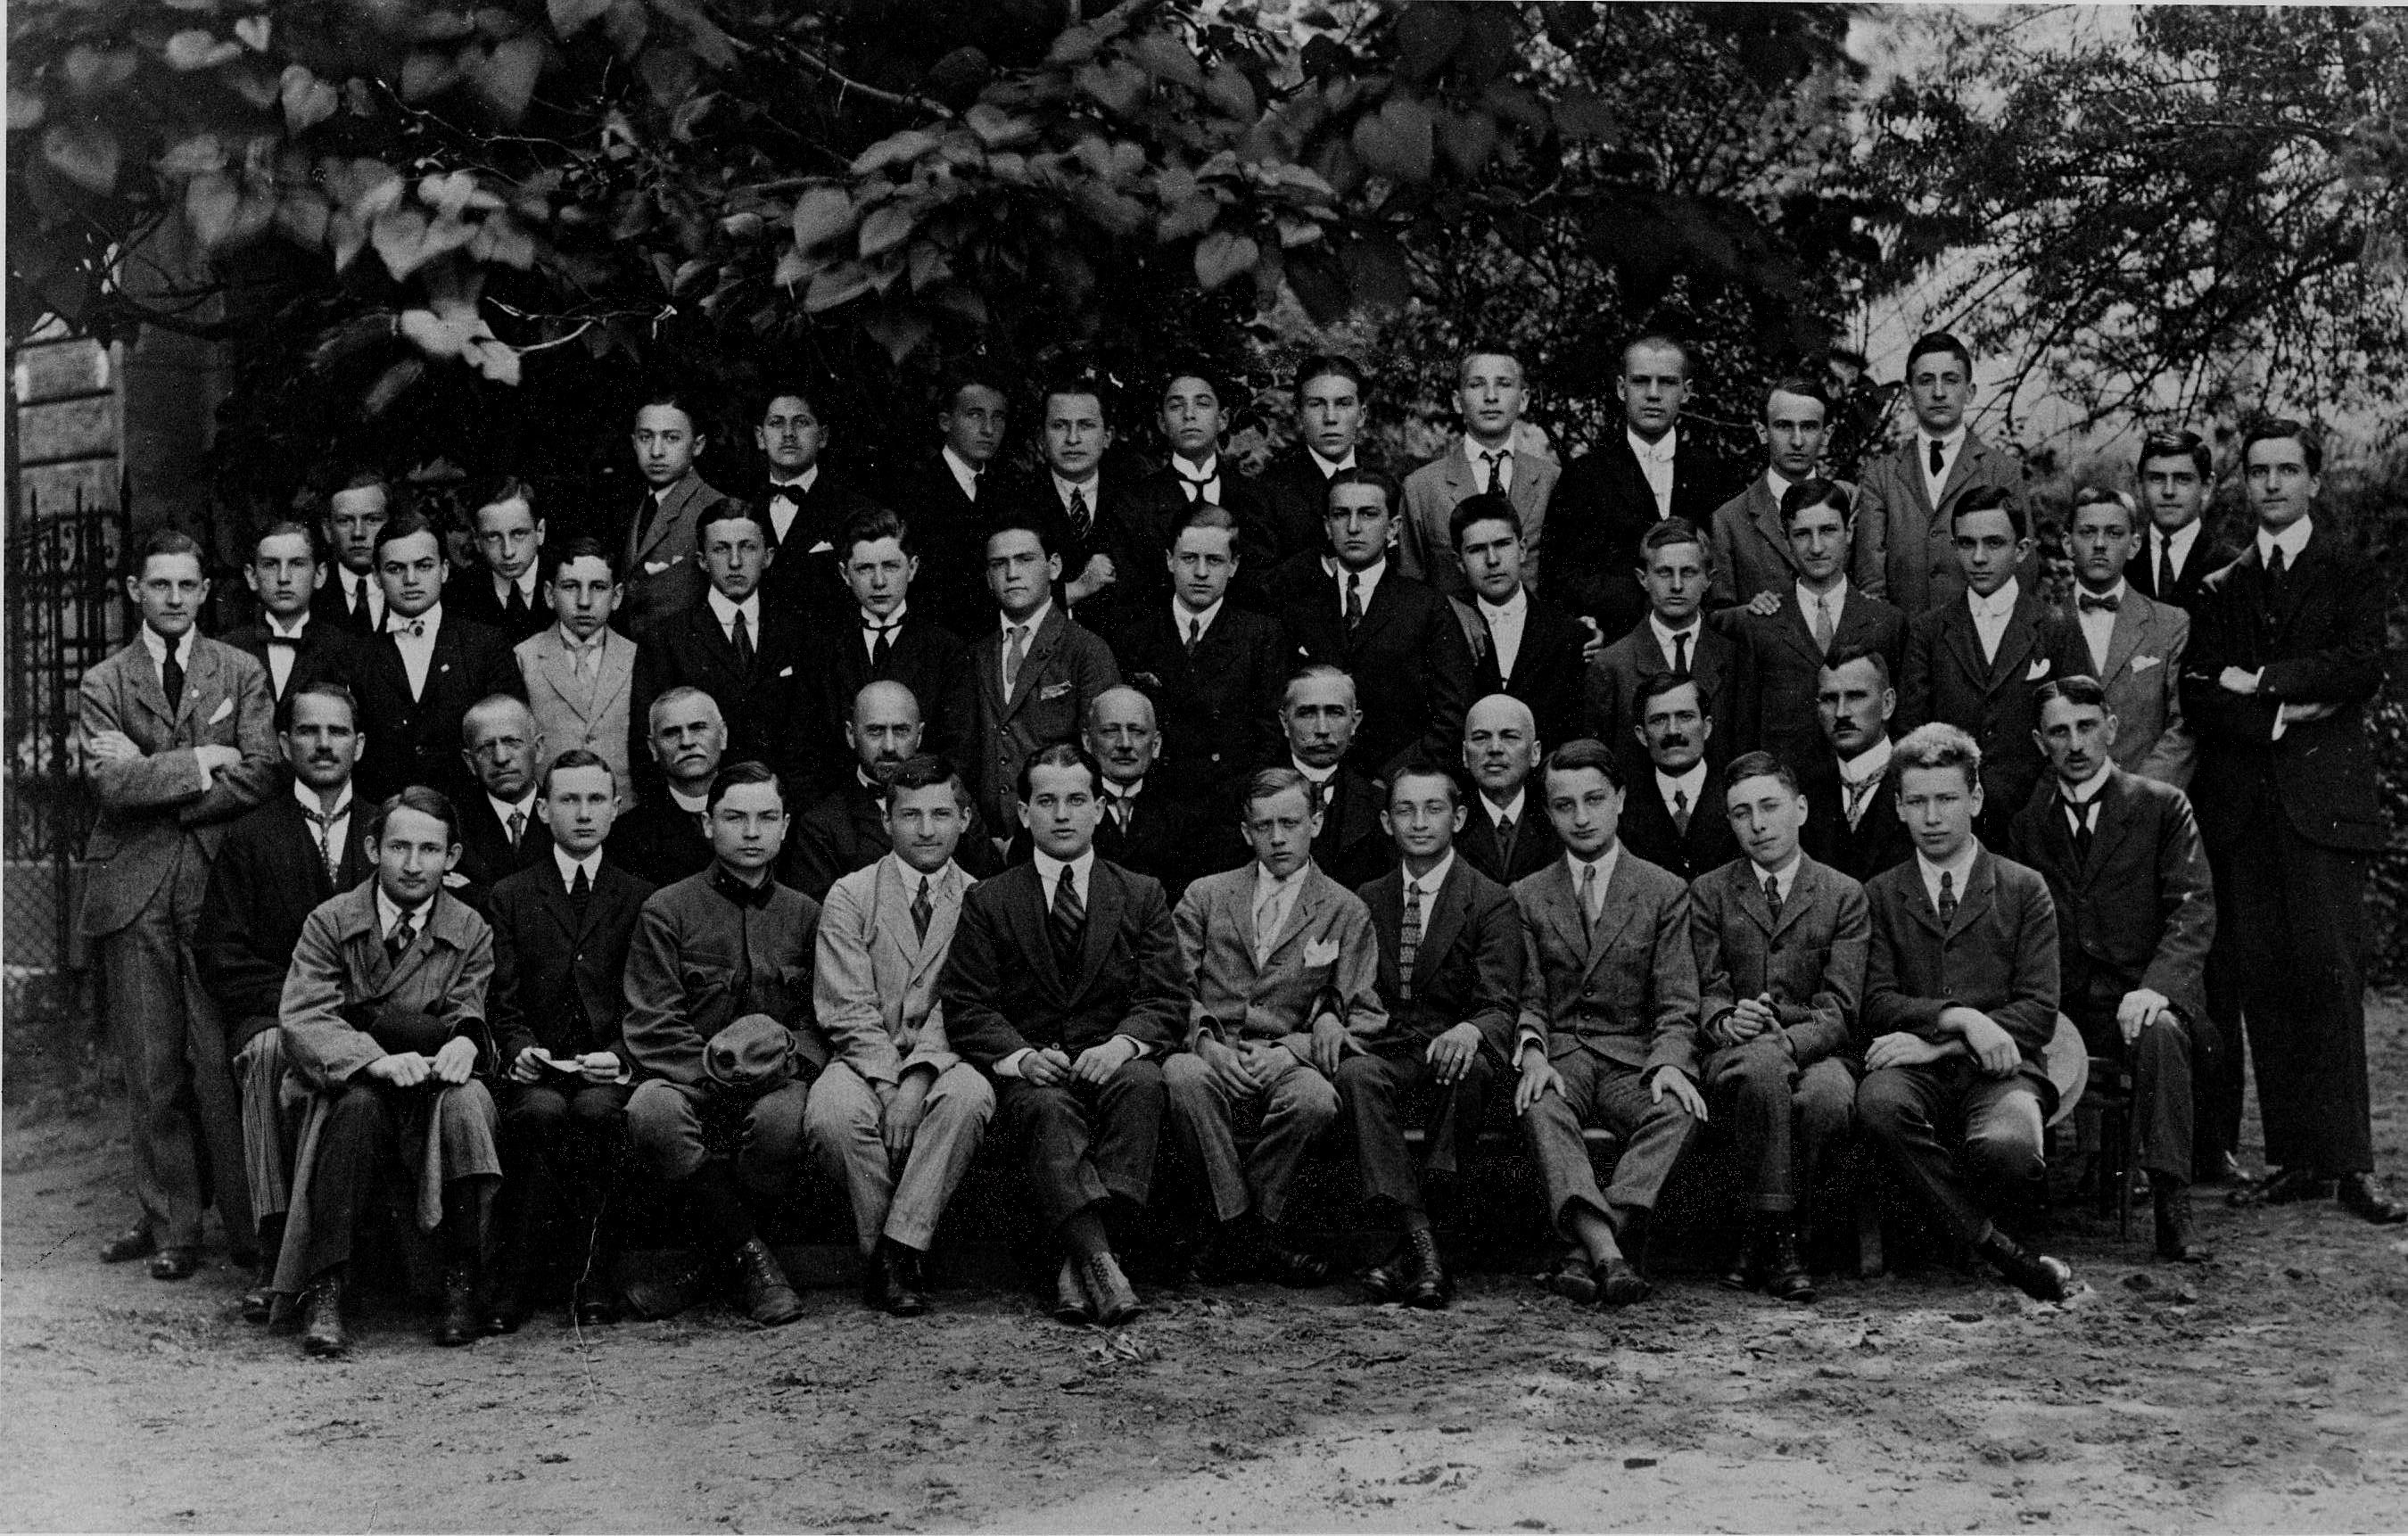 fasori_gimna_zium_highschool_class_1919_ra_tz_la_szlo.jpg